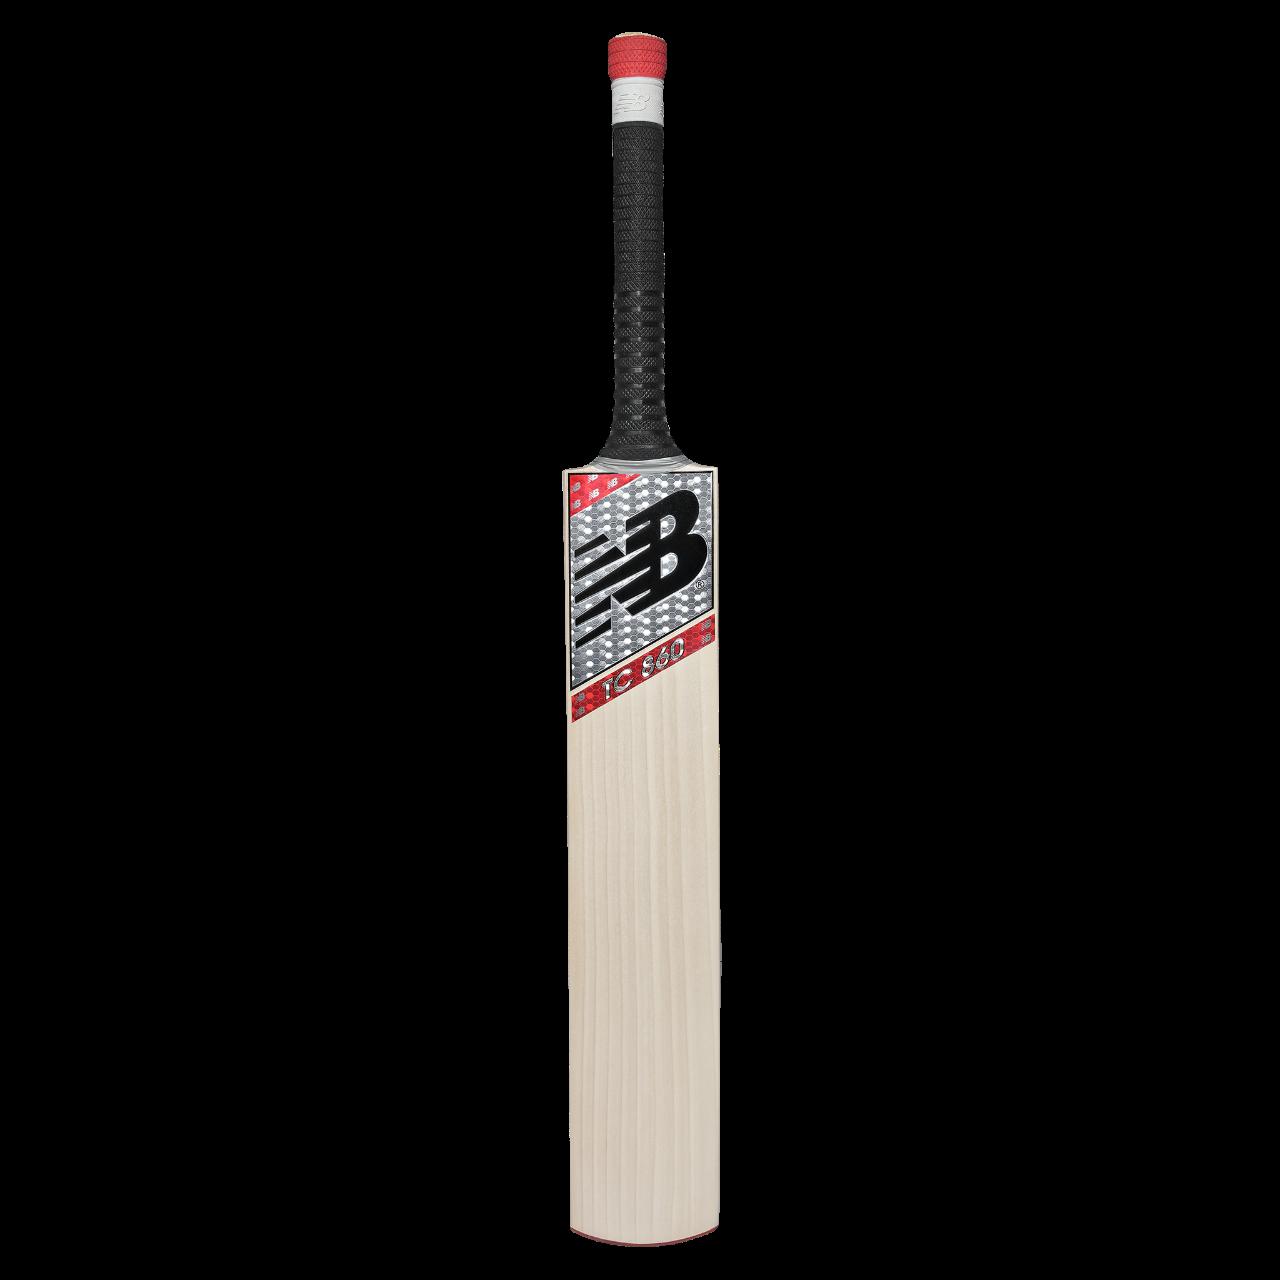 2020 New Balance TC 560 Cricket Bat